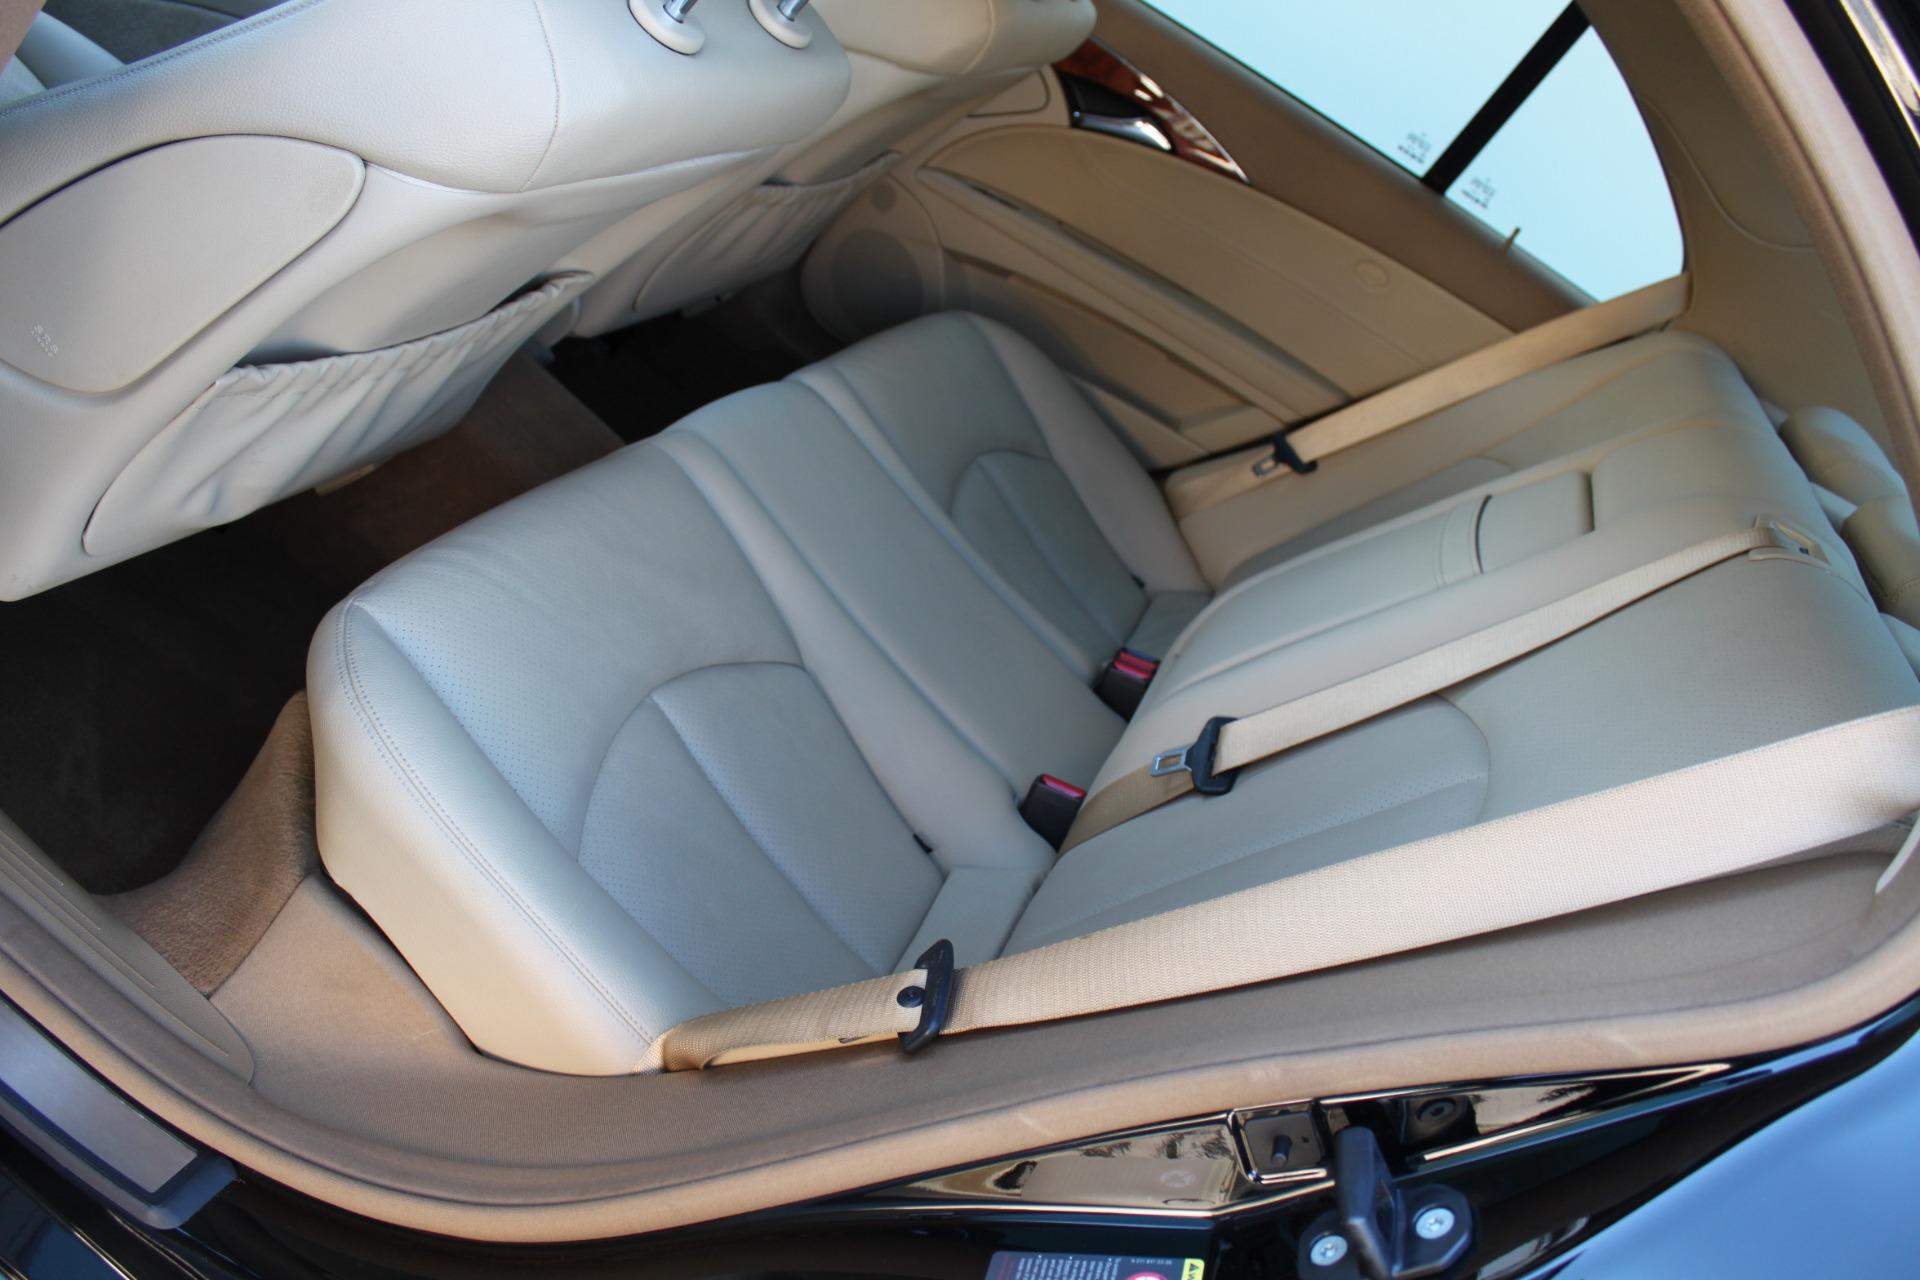 Used-2009-Mercedes-Benz-E-Class-E320-30L-BlueTEC-Chevrolet